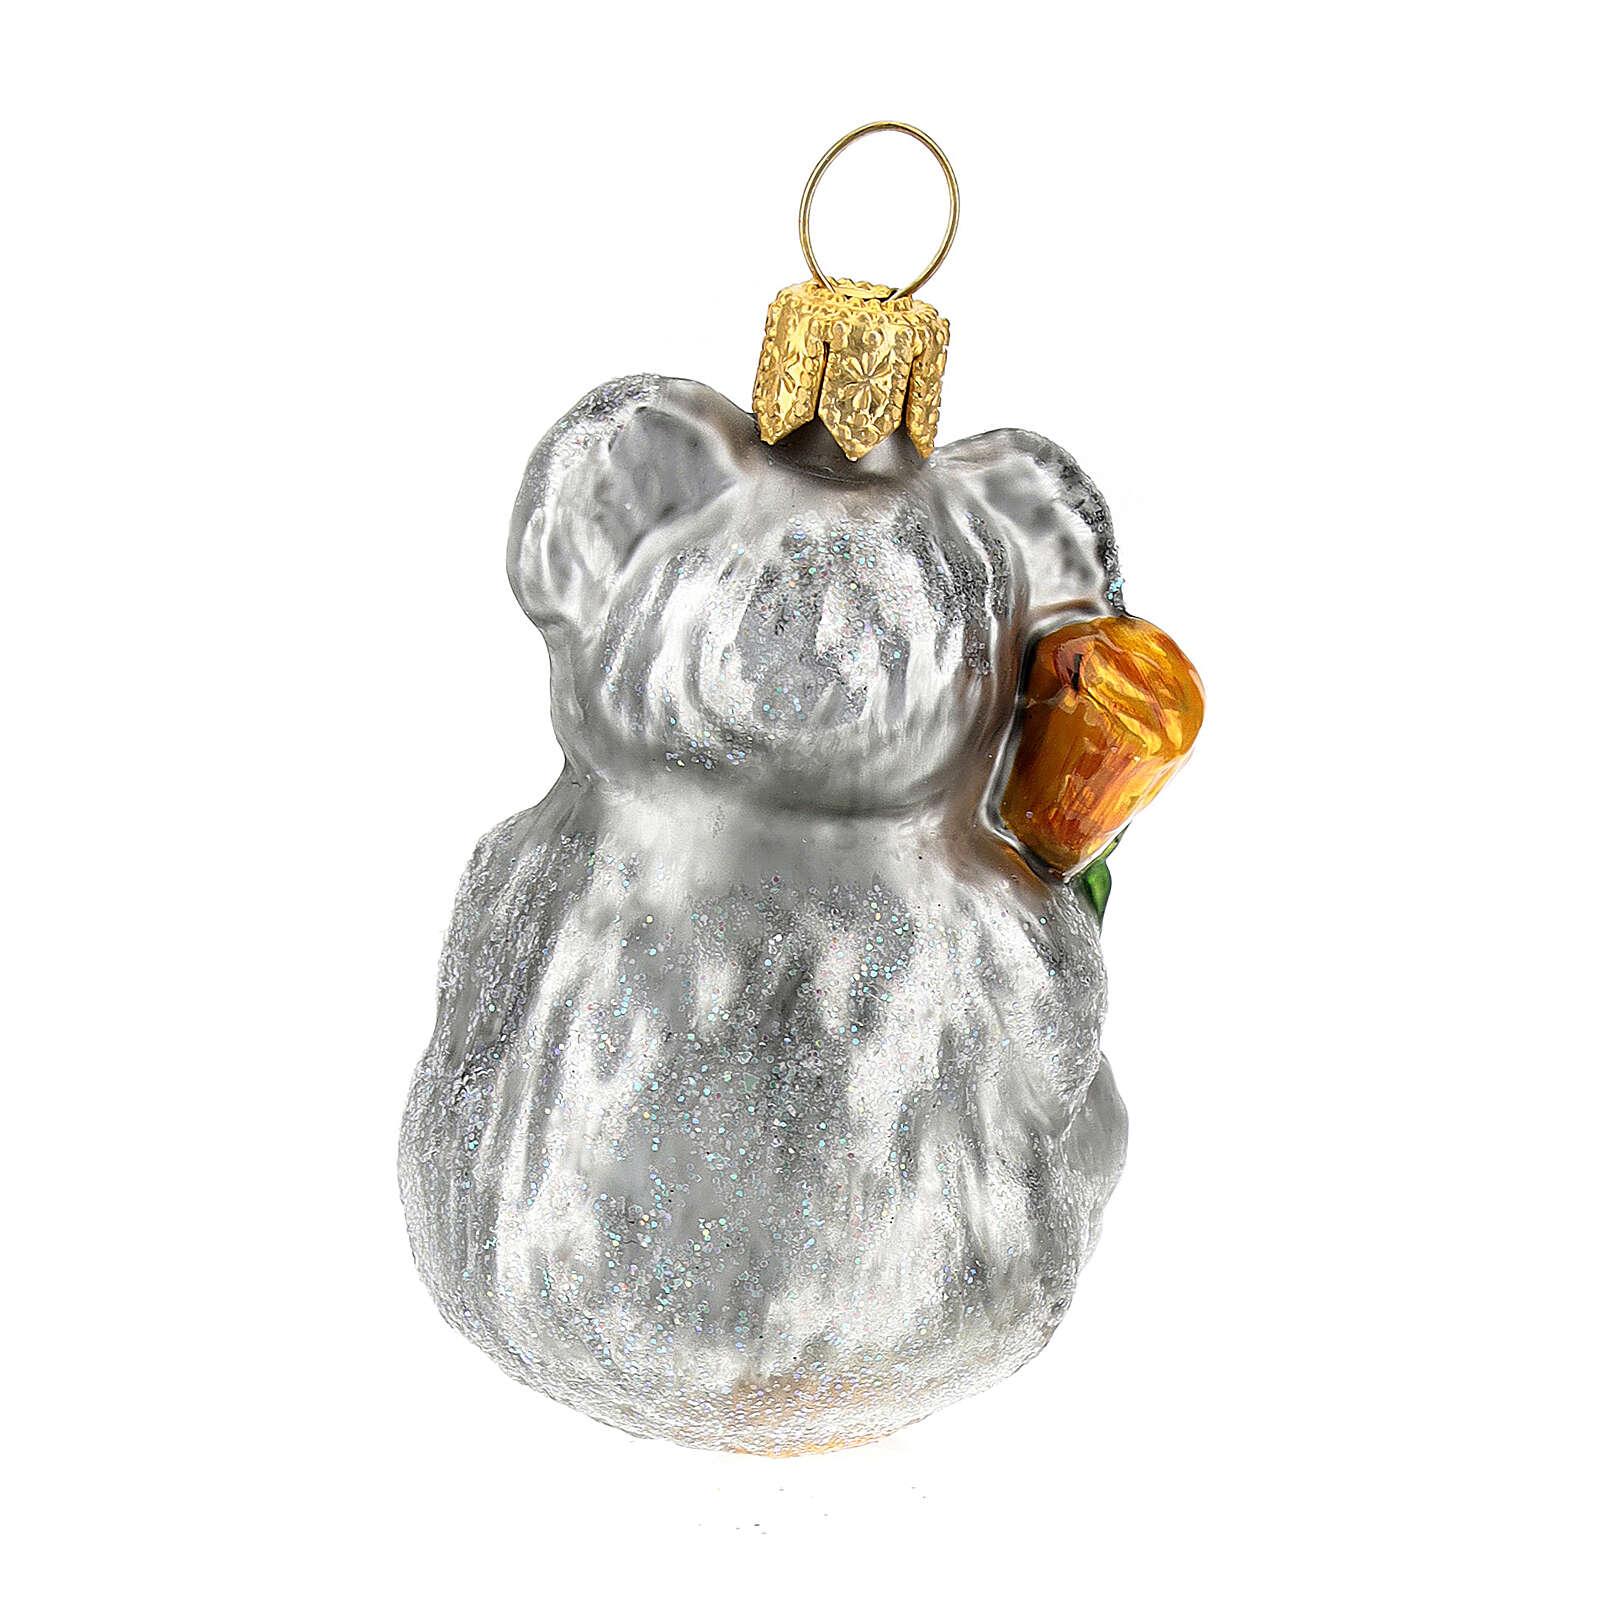 Blown glass Christmas ornament, koala 4